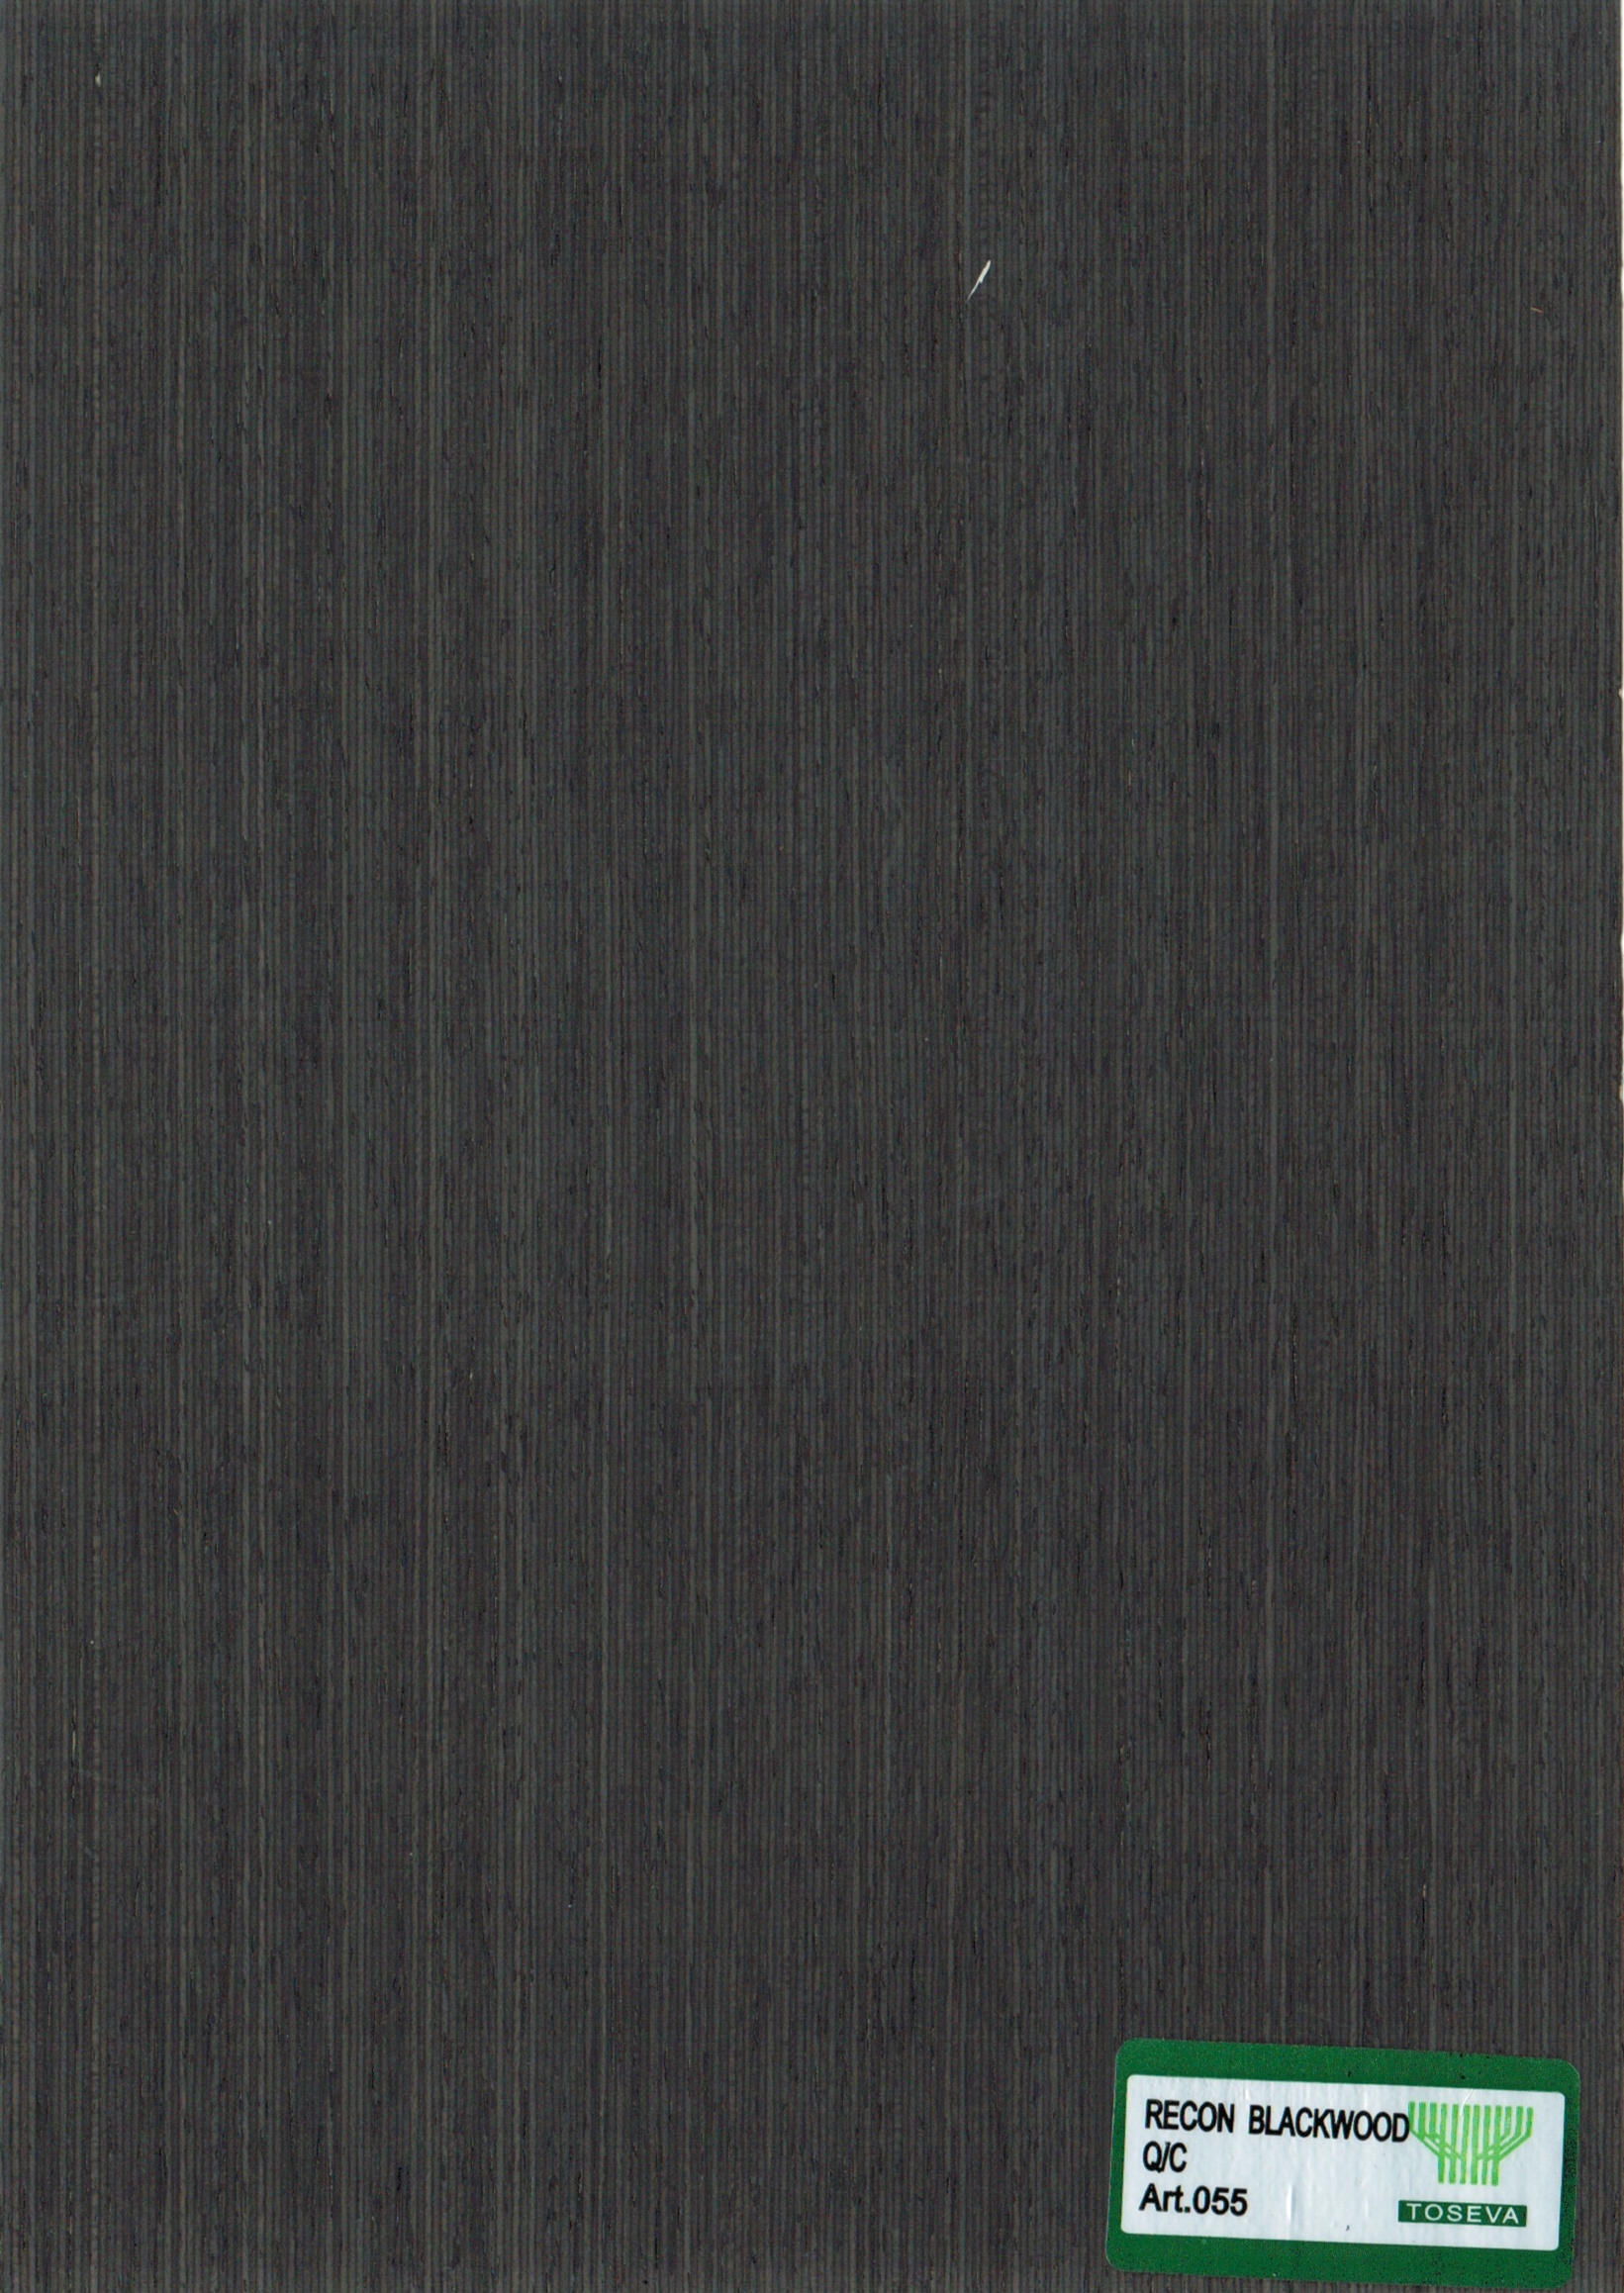 RECON BLACKWOOD Q:C - 055.jpeg